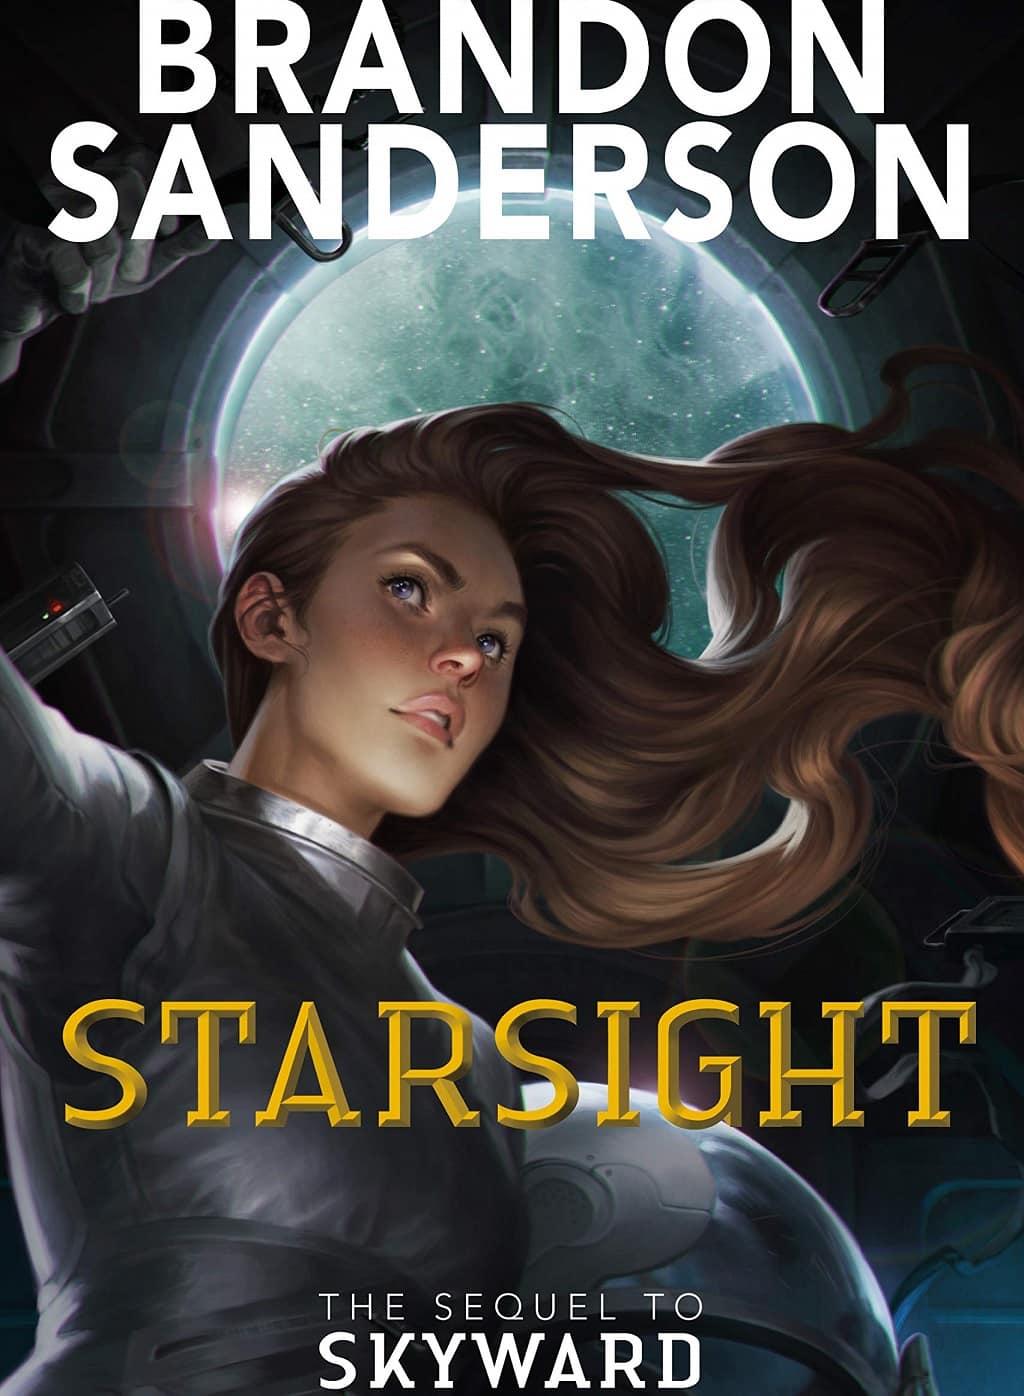 Skyward 2 -Starsight Audiobook Free Download